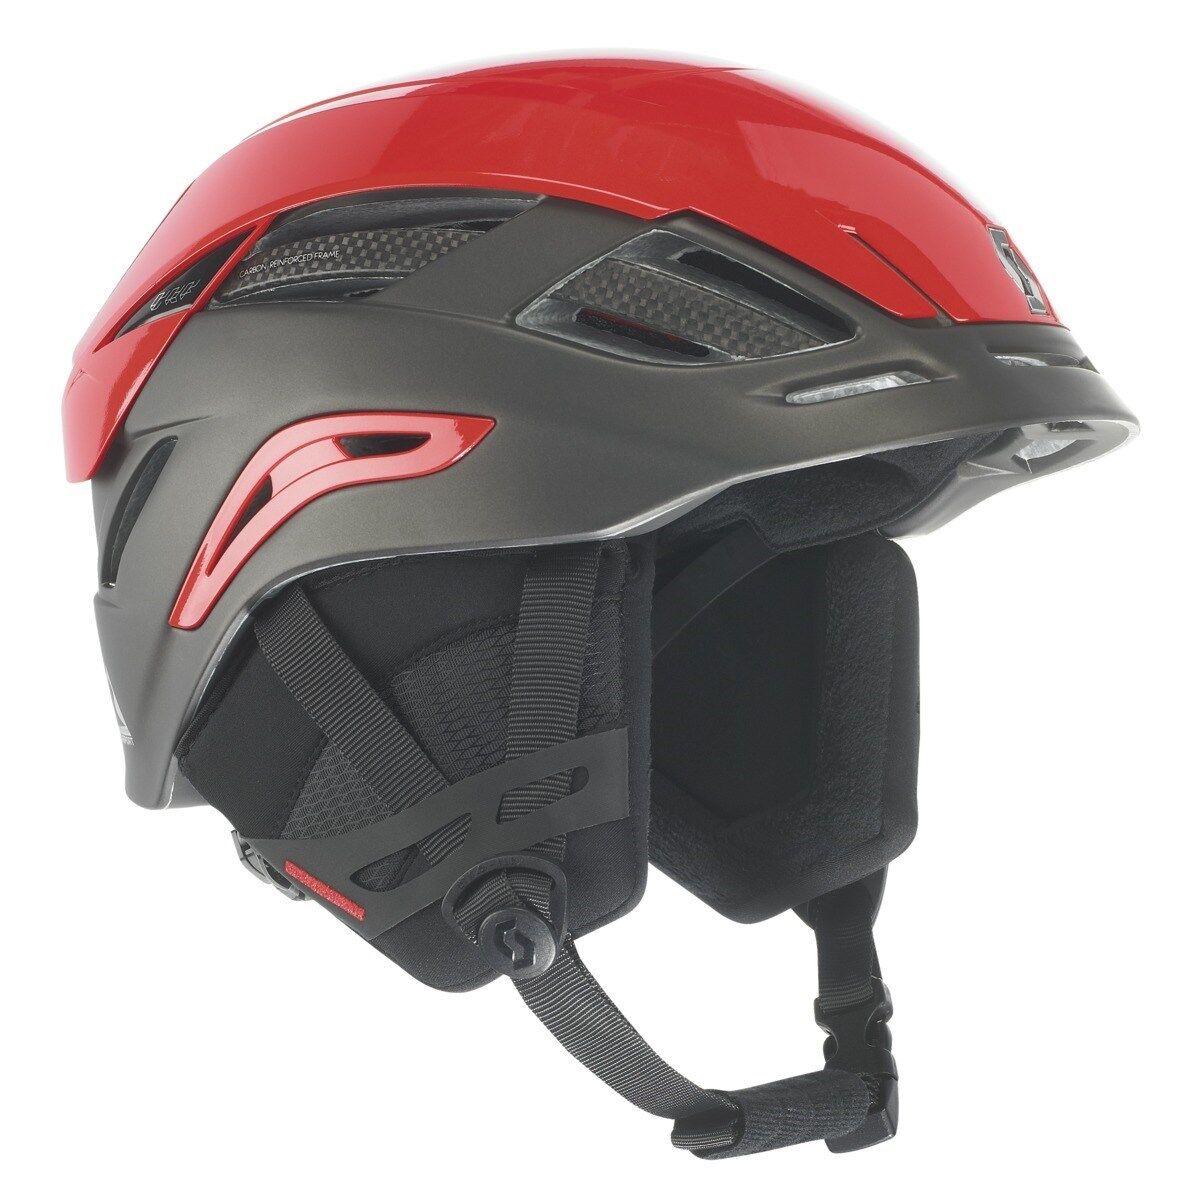 Scott Couloir Helmet Dark grau   Matte rot Large 59.5 - 61.5 cm